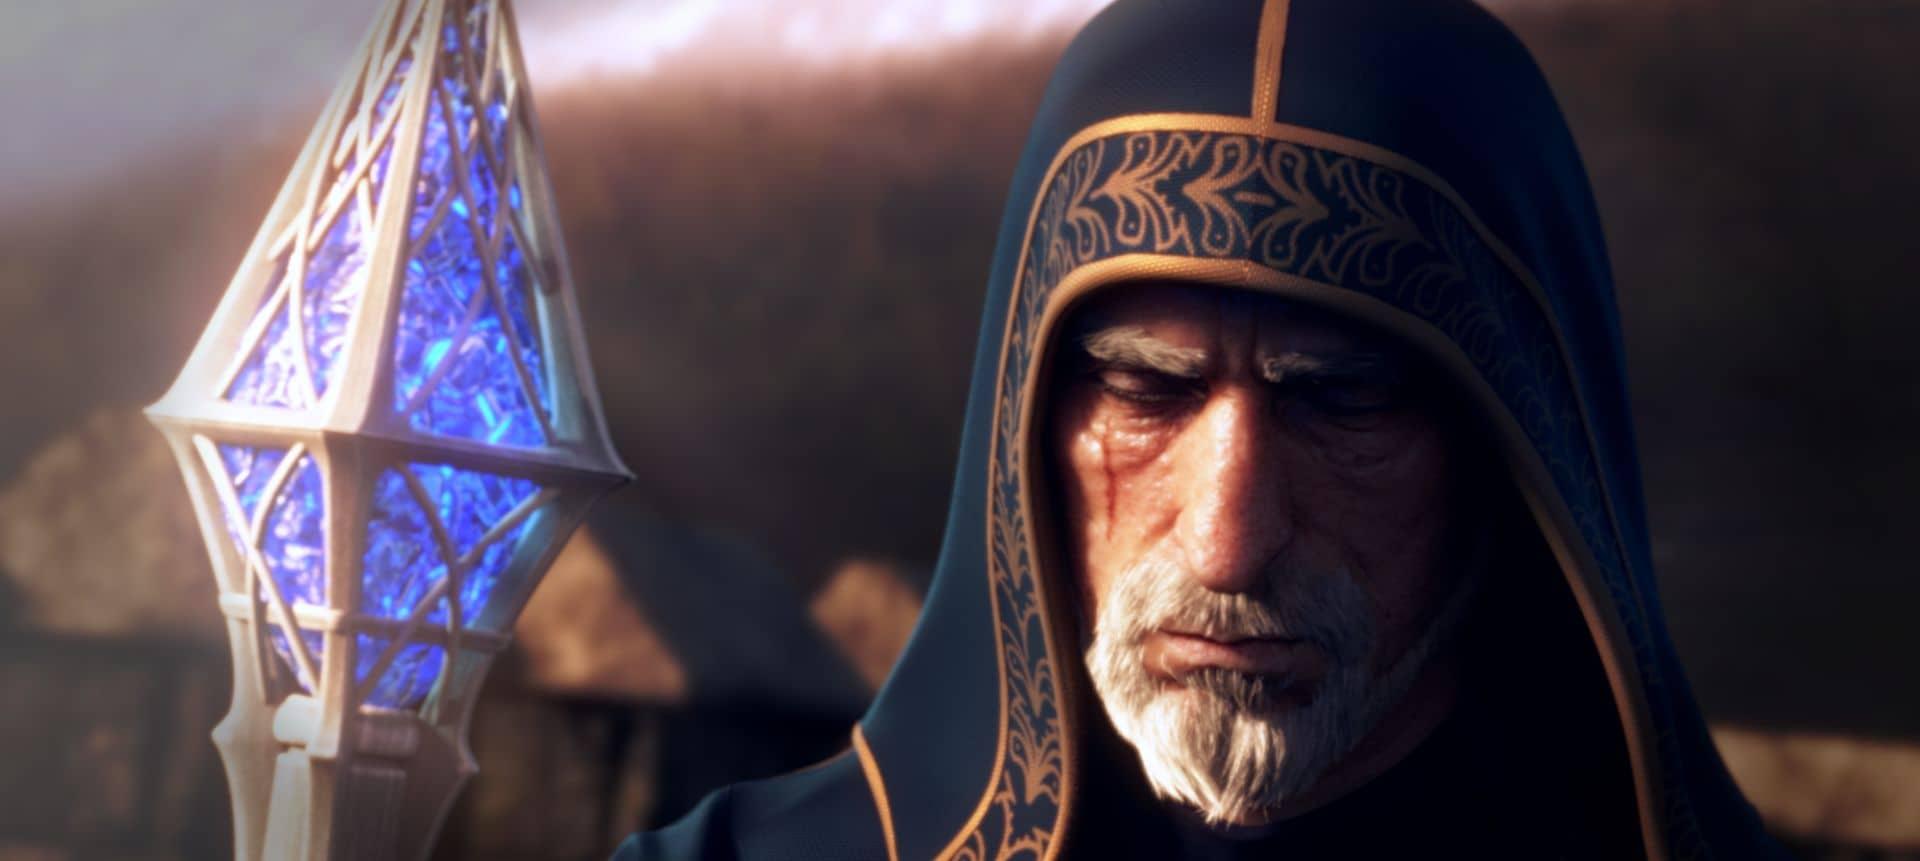 The Brotherhood of Steel: Fantasy Animation Teaser Trailer